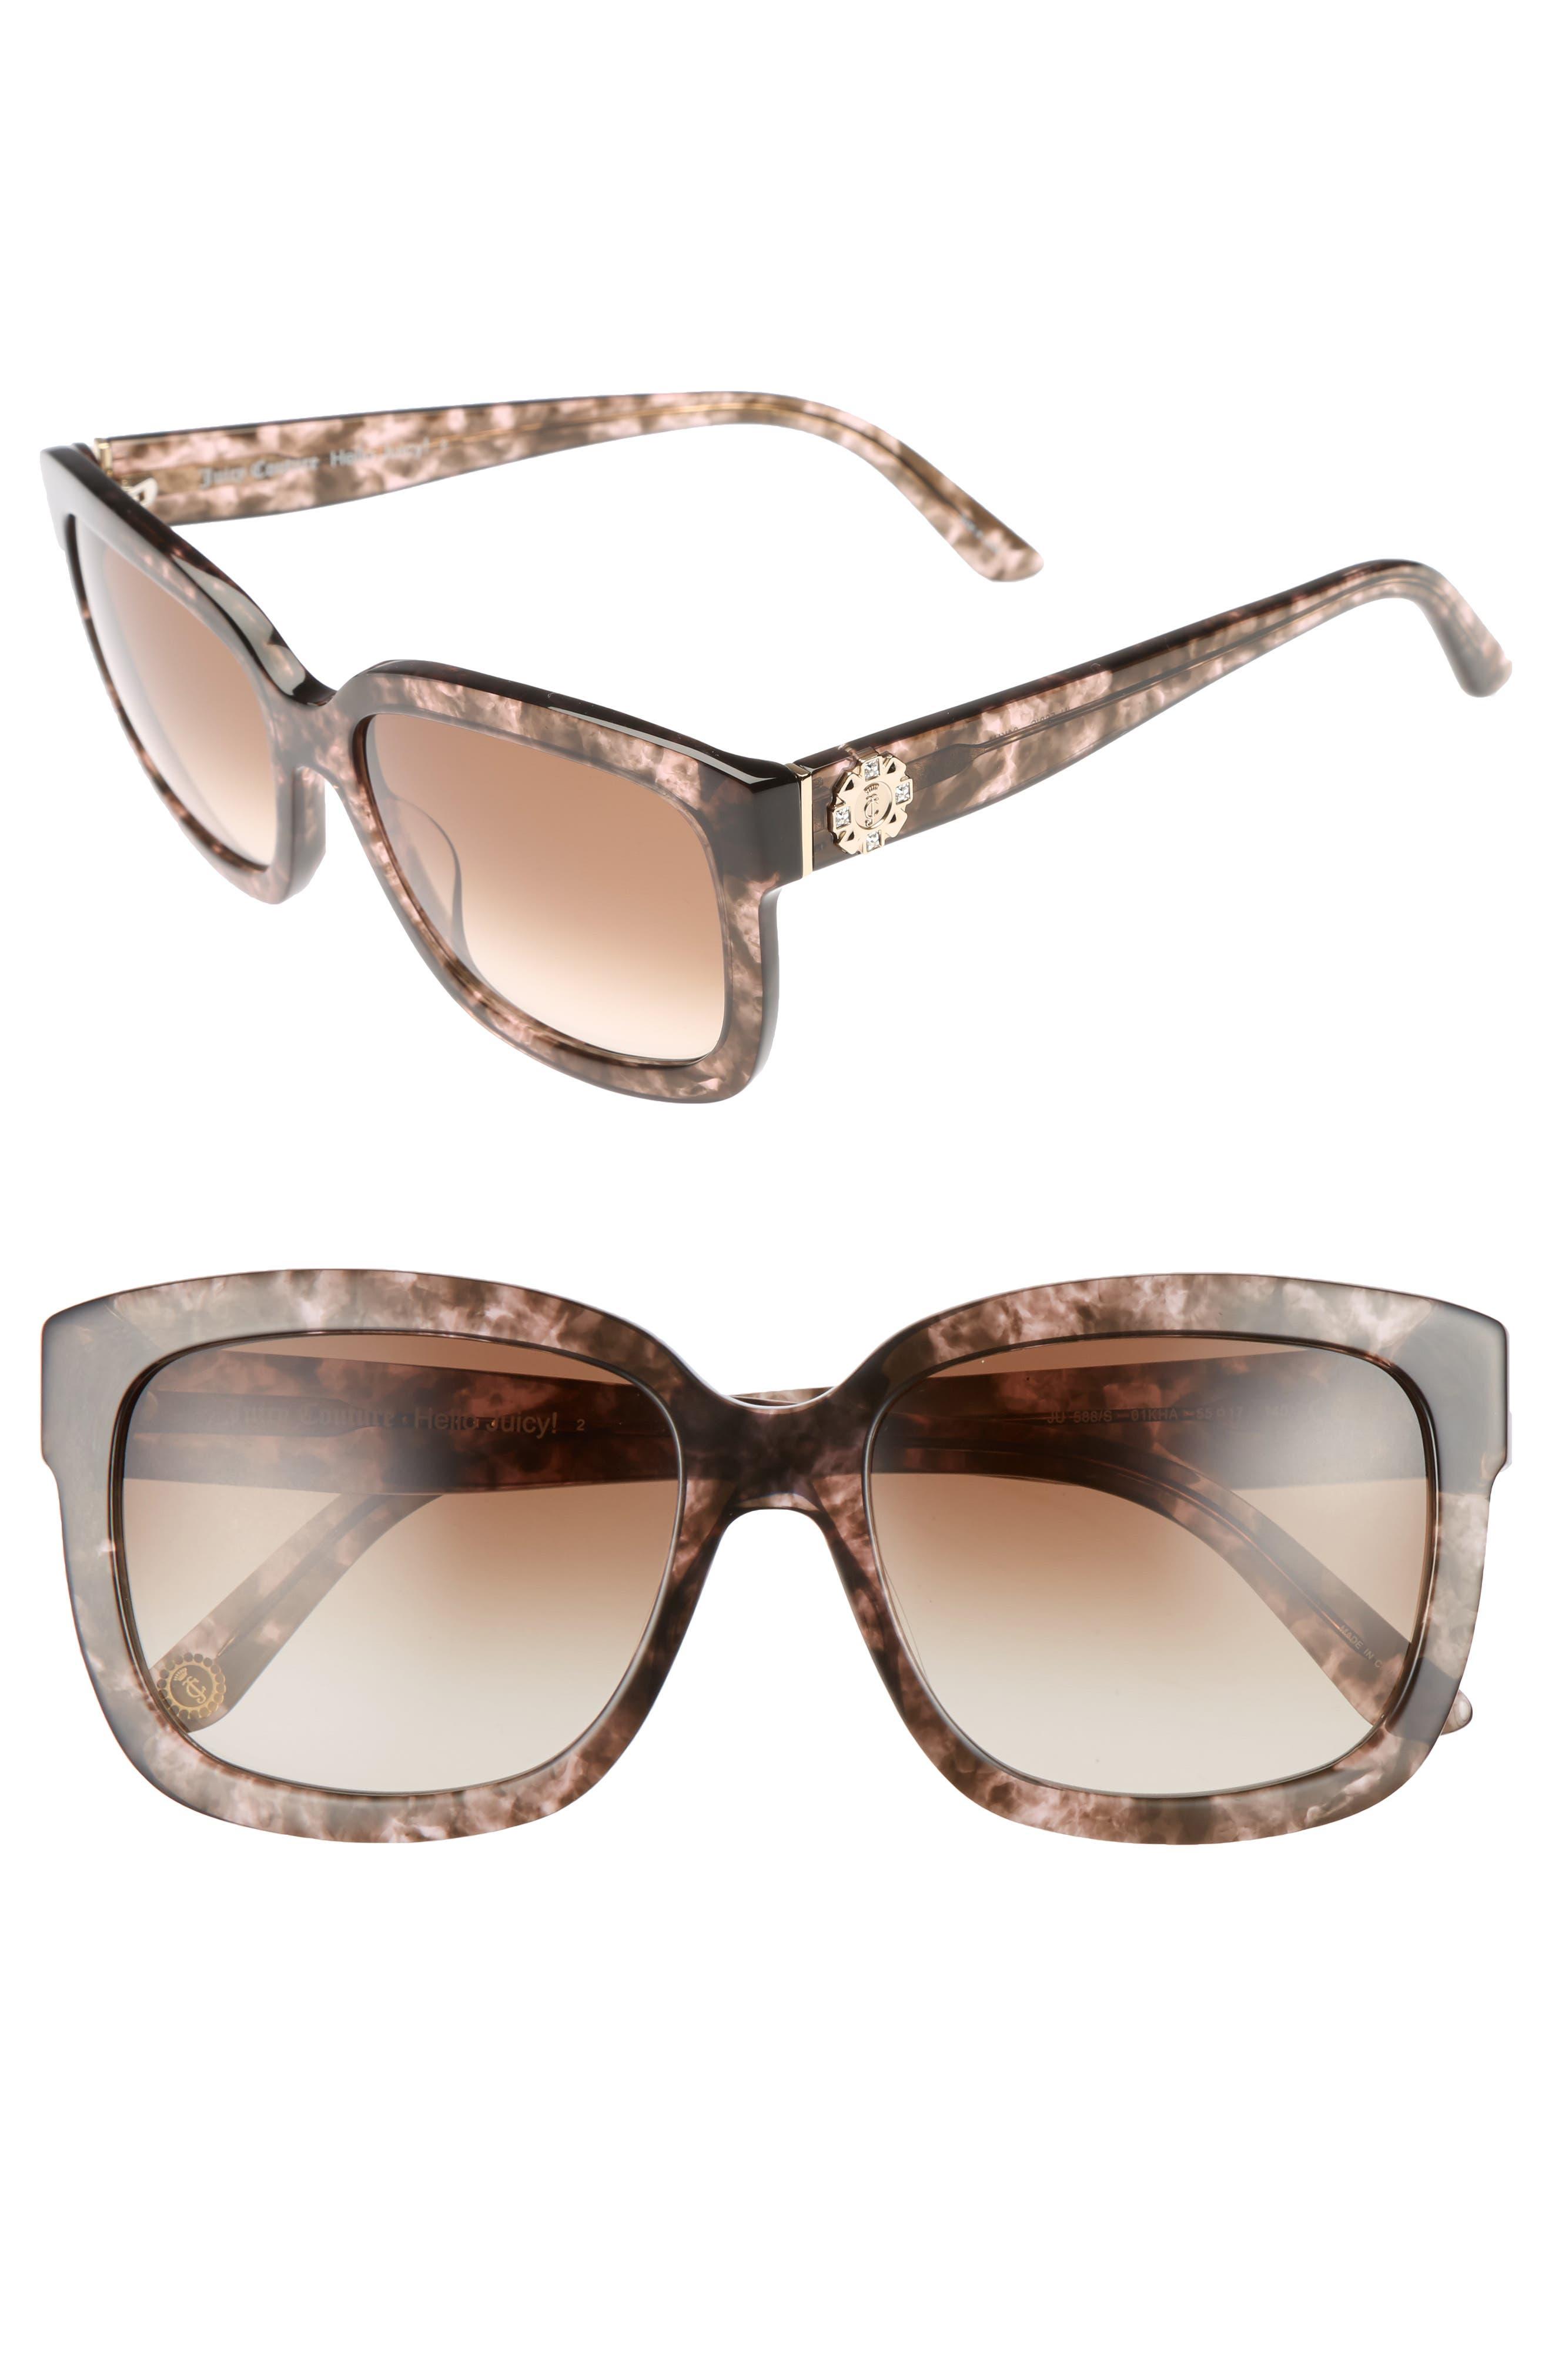 Black Label 55mm Square Sunglasses,                             Main thumbnail 1, color,                             210